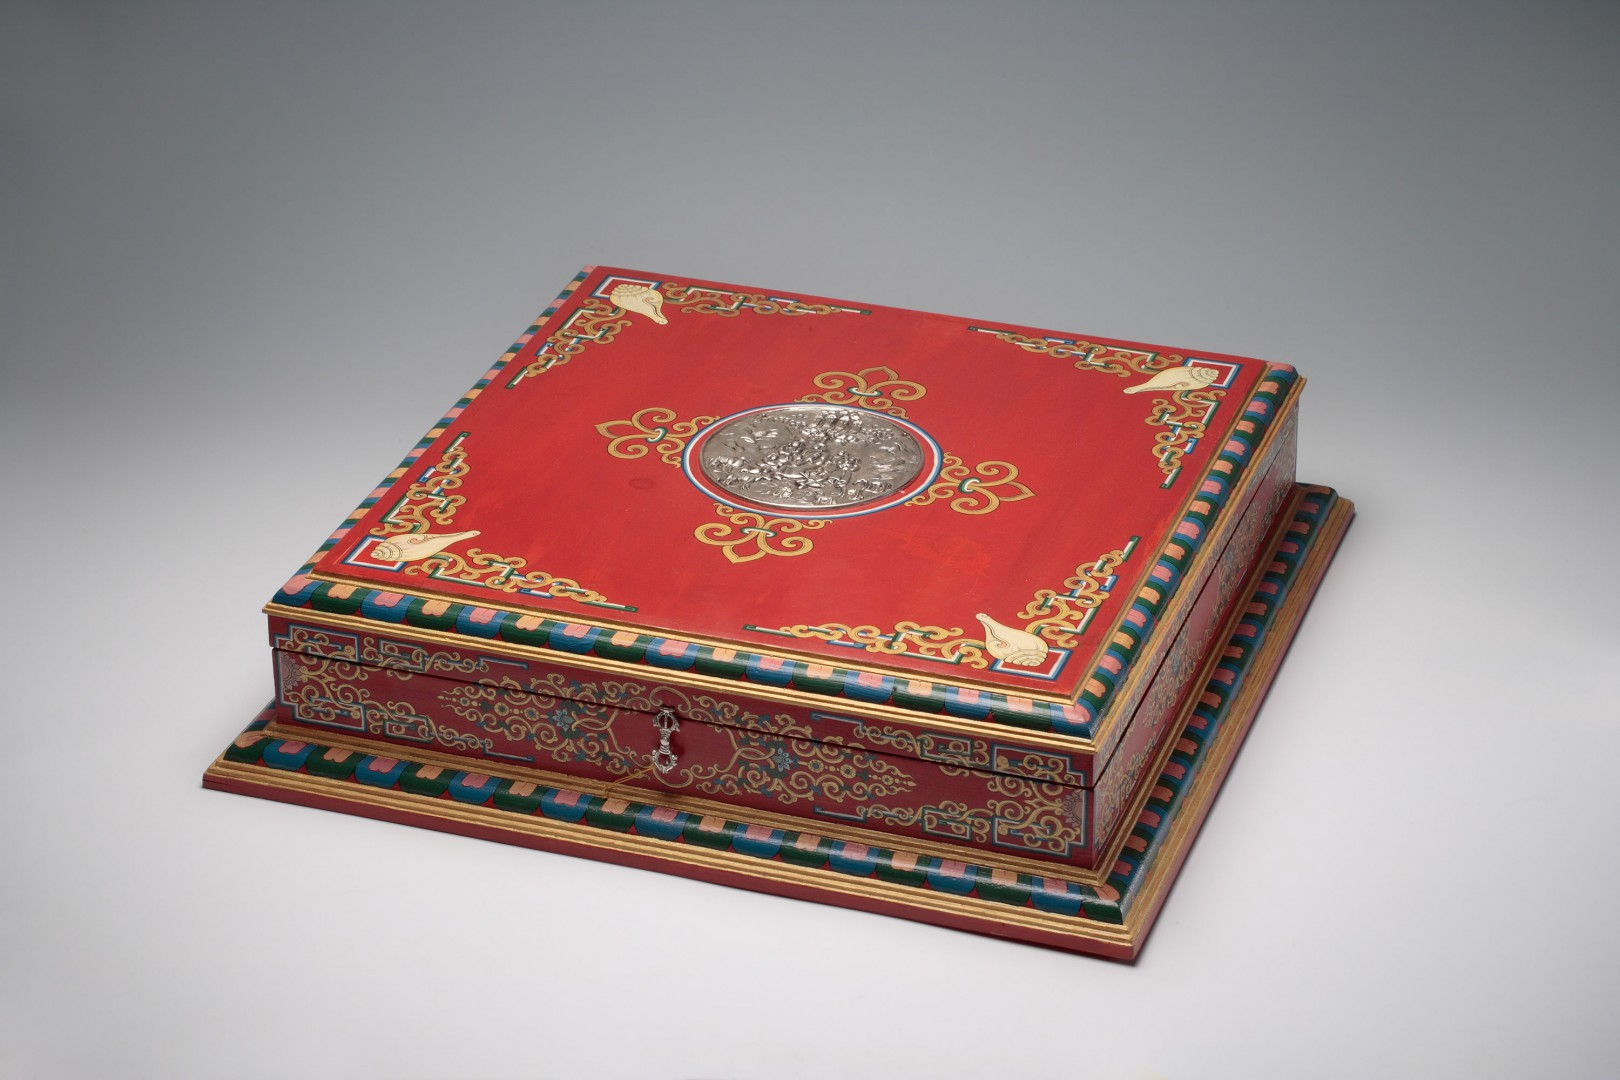 Frantisek Kupka Clovek A Zeme Mongolska Buddhisticka Uprava